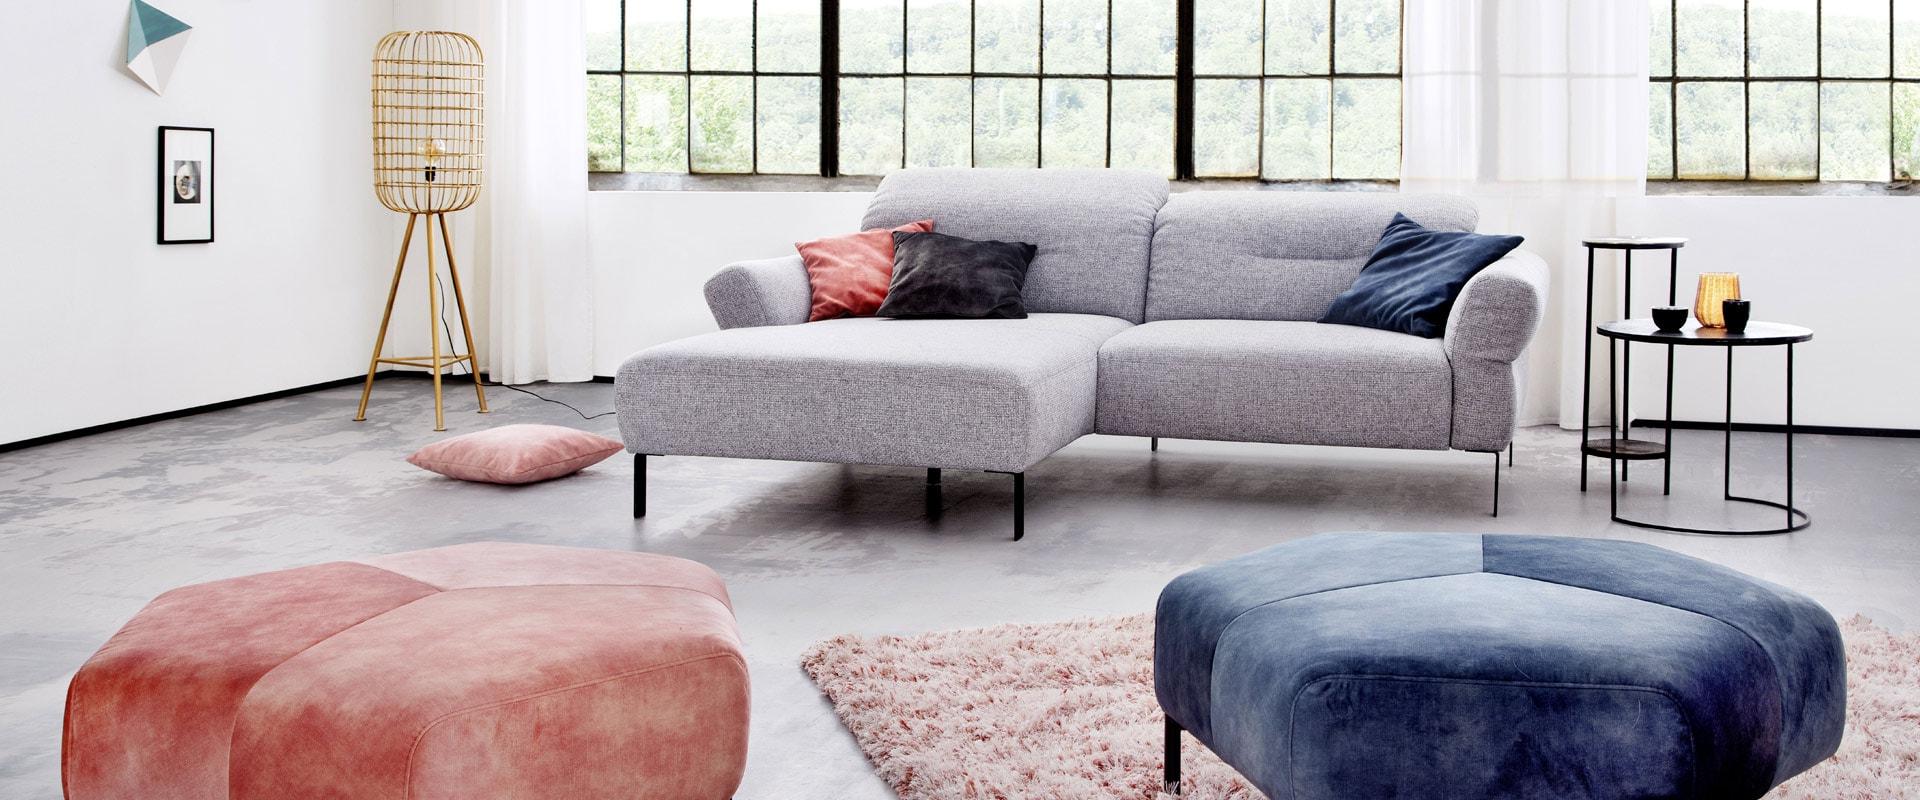 Fashionable Polstermöbel Von Comfort Republic – Berkemeier Home Company Inside Clemens Patio Sofas (View 9 of 25)